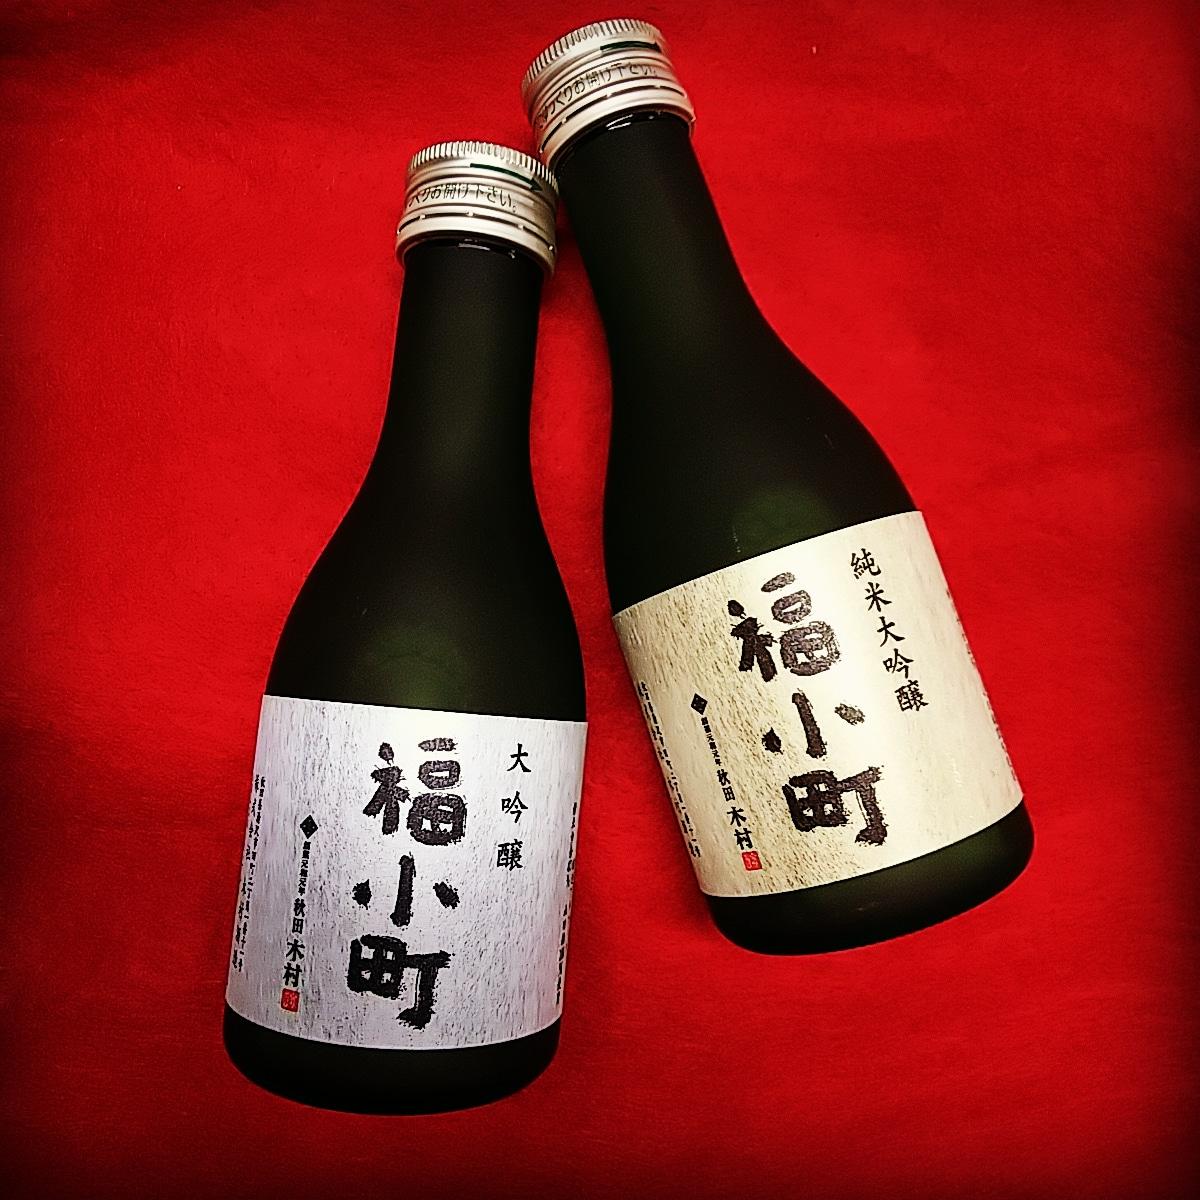 http://www.fukukomachi.com/blog/photo/IMG_20181120_140536_505.jpg